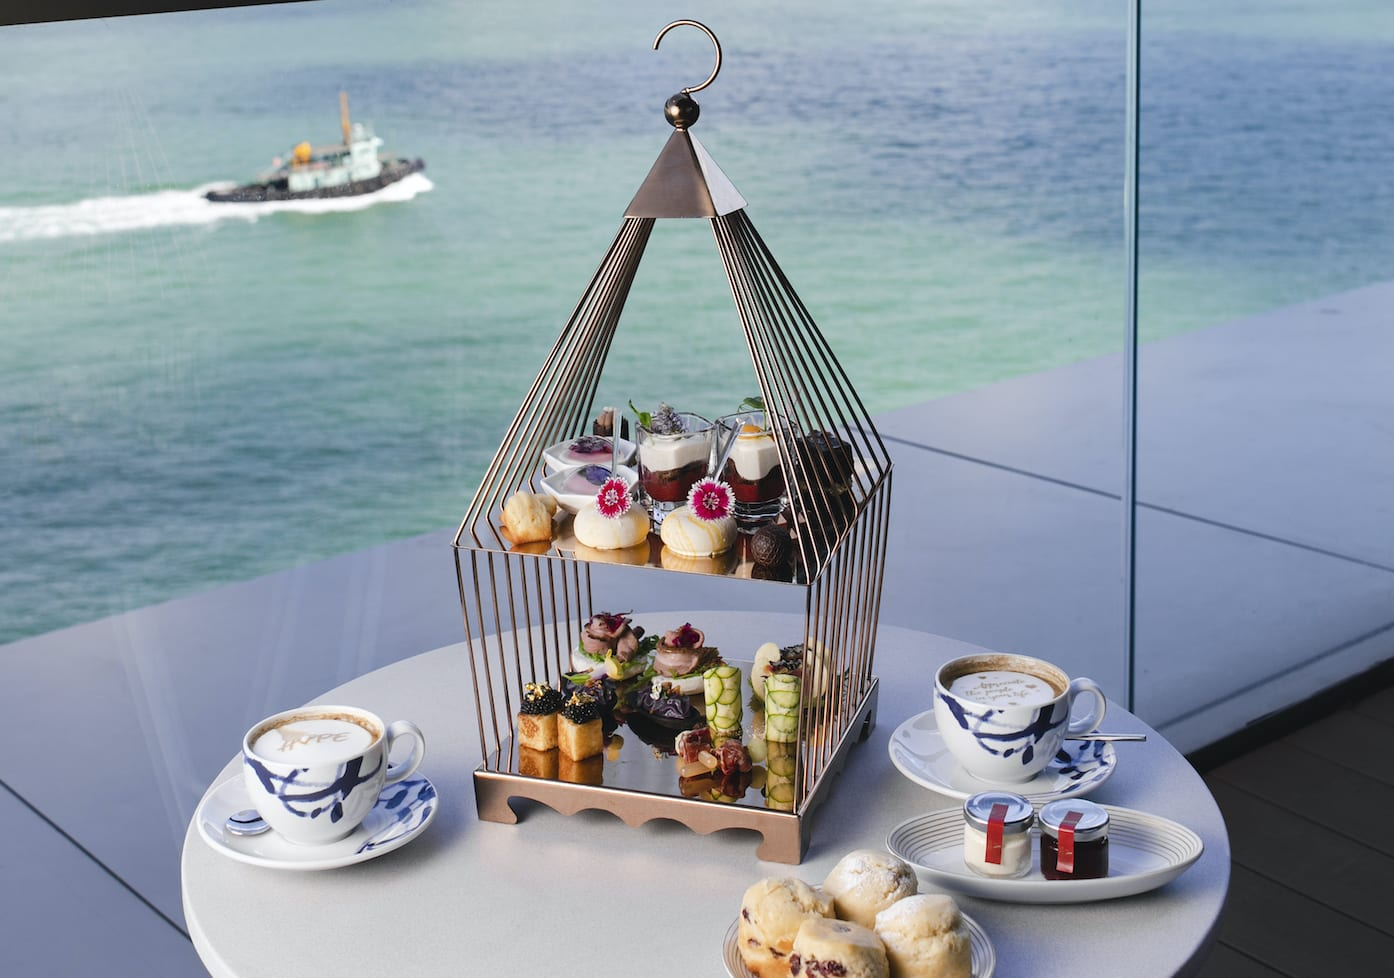 Artisanal afternoon-tea set K11 Artus